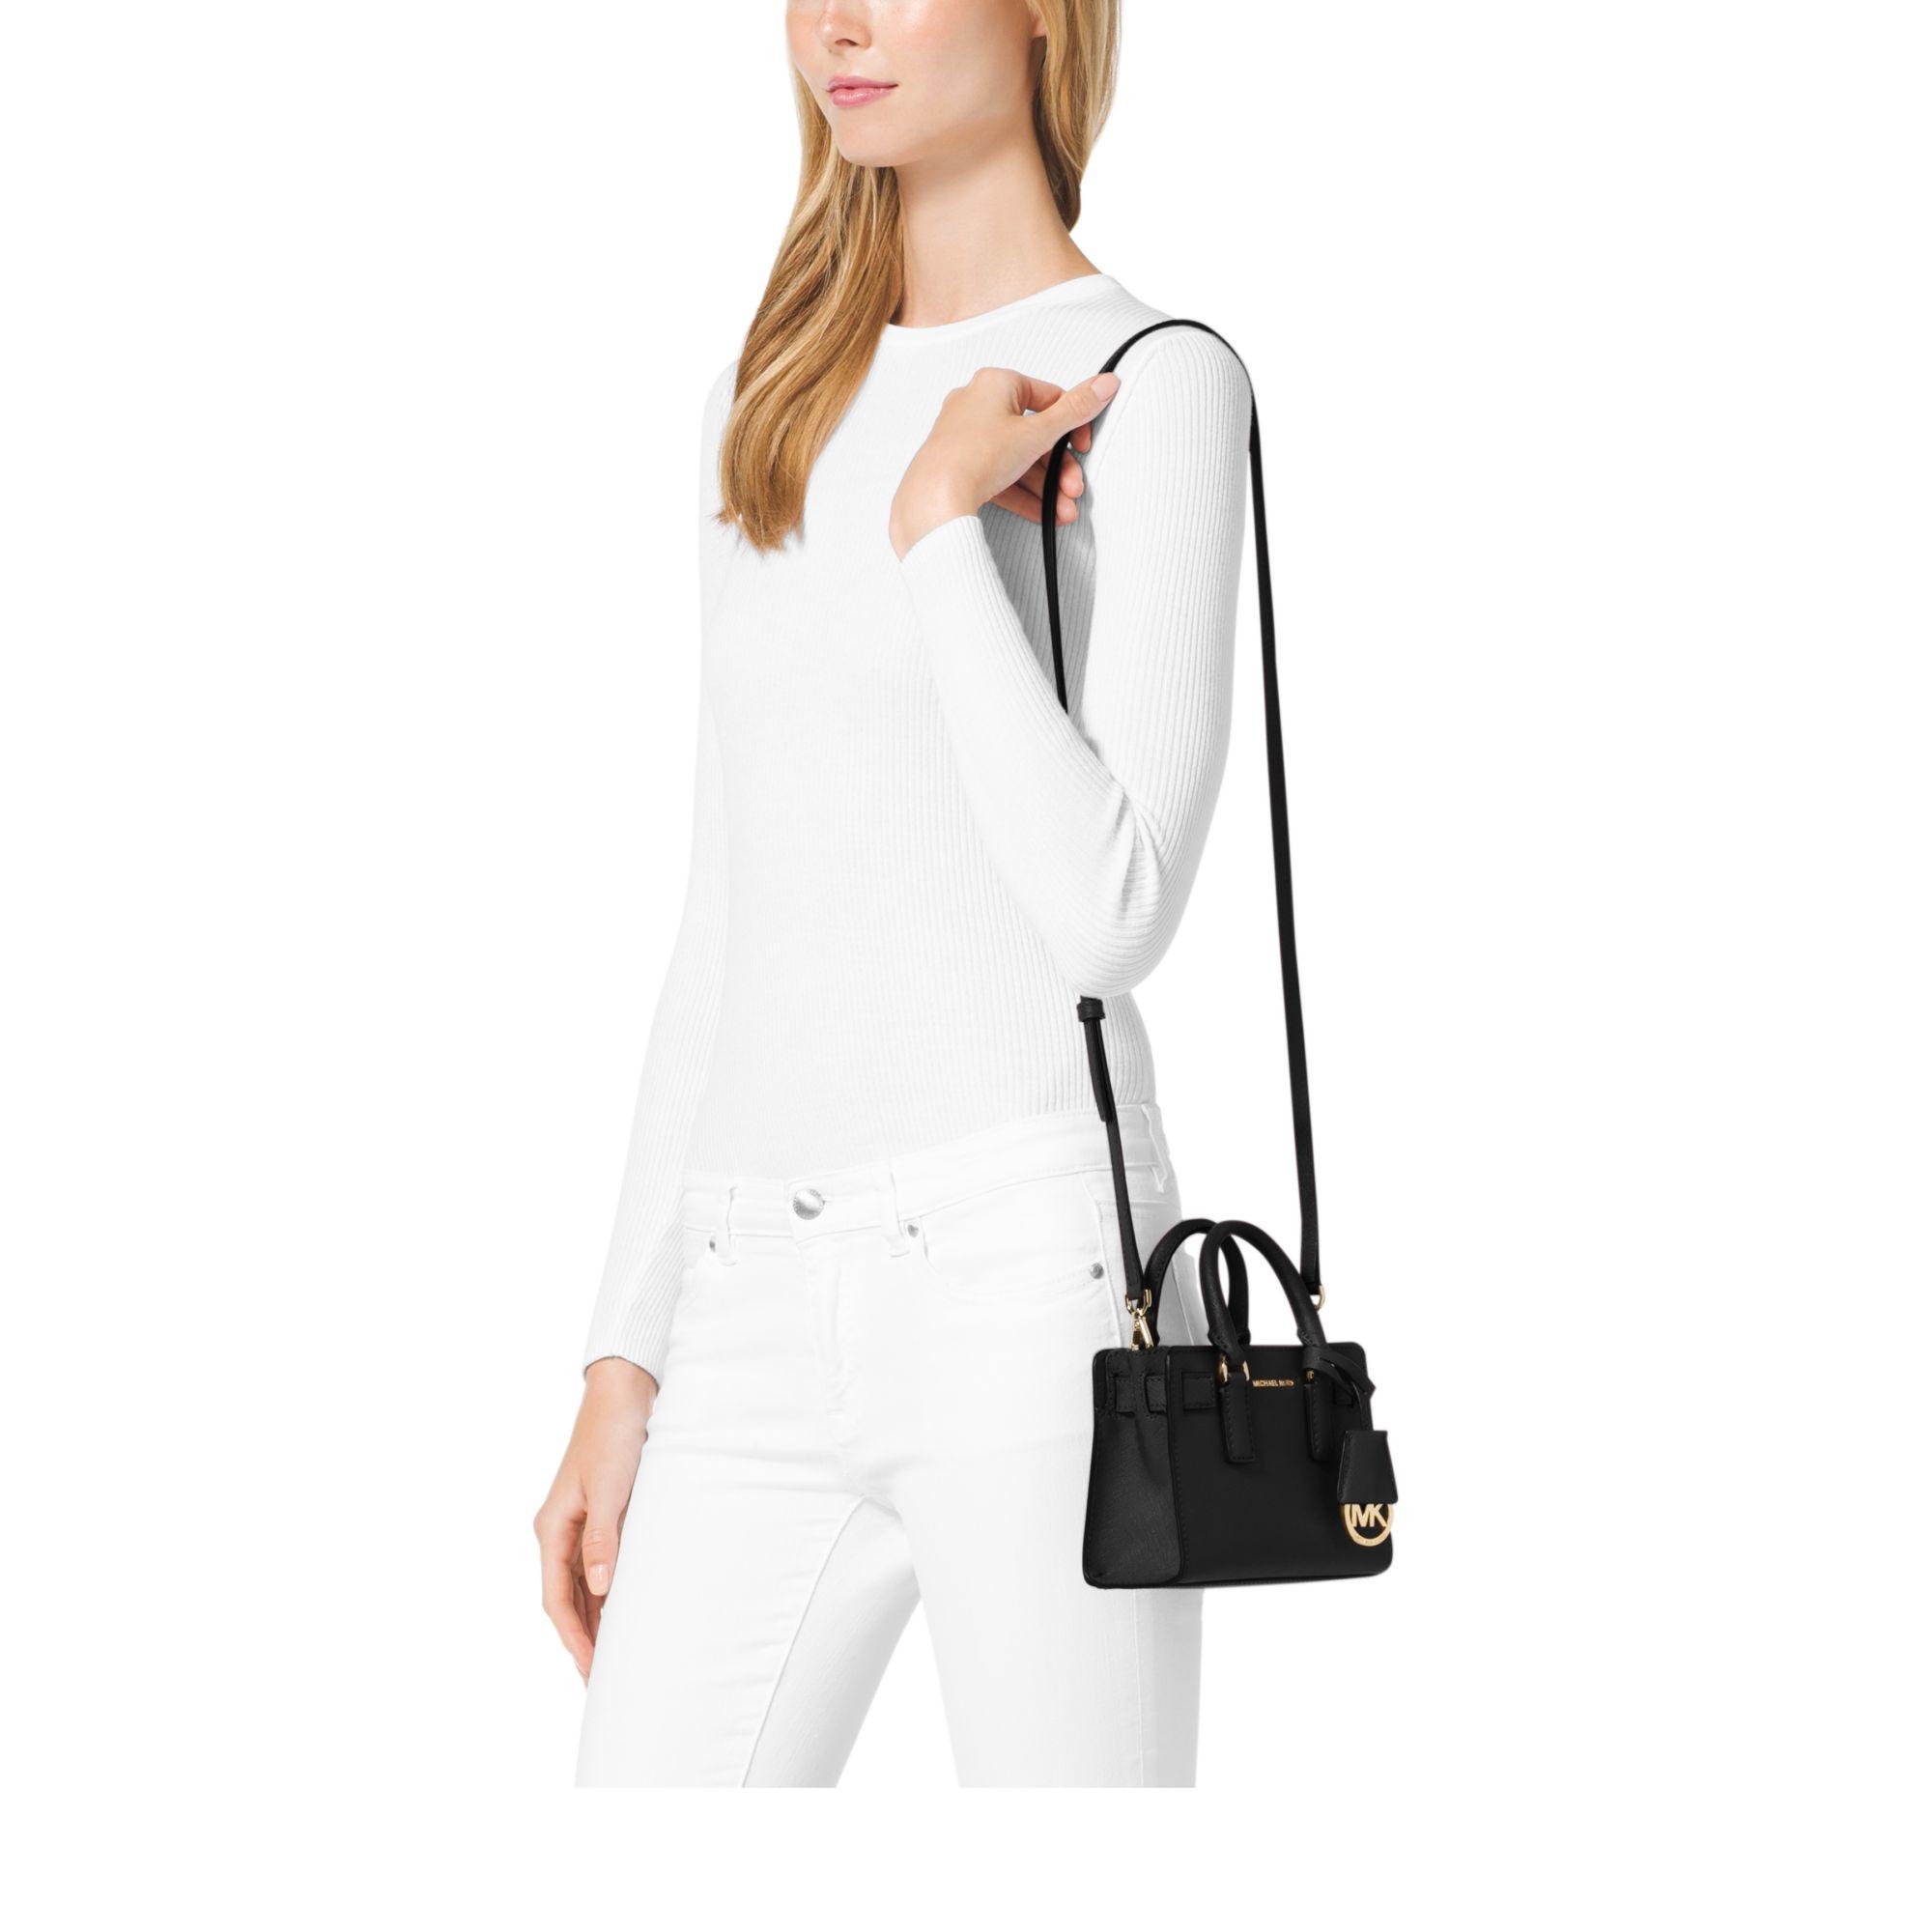 732e8718c Michael Kors Dillon Extra-Small Cross-Body Bag in Black - Lyst